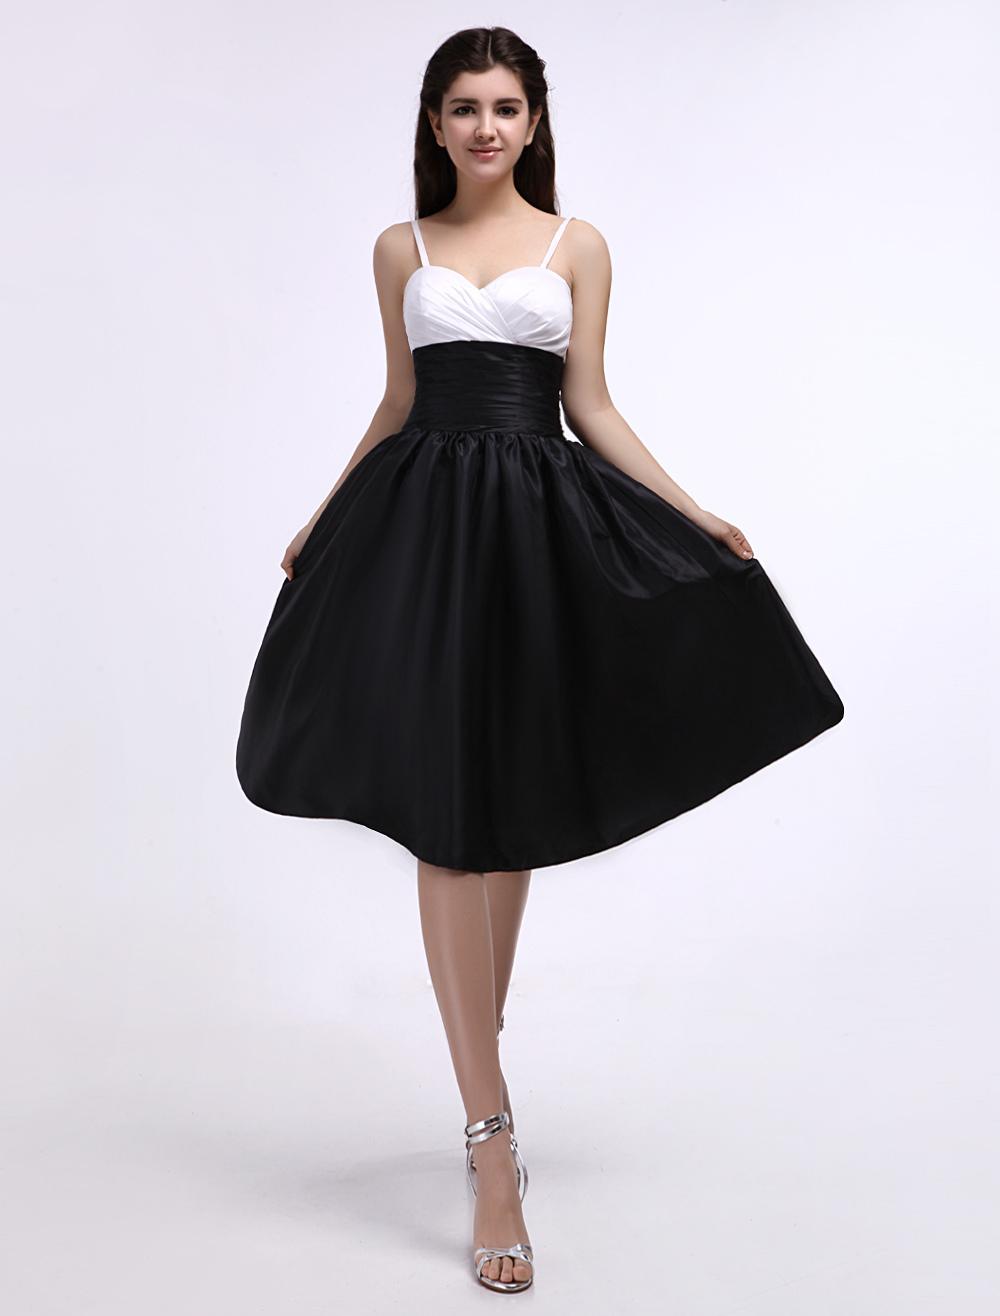 Black And White Taffeta Sweetheart Spaghetti Strap Bridesmaid Dress